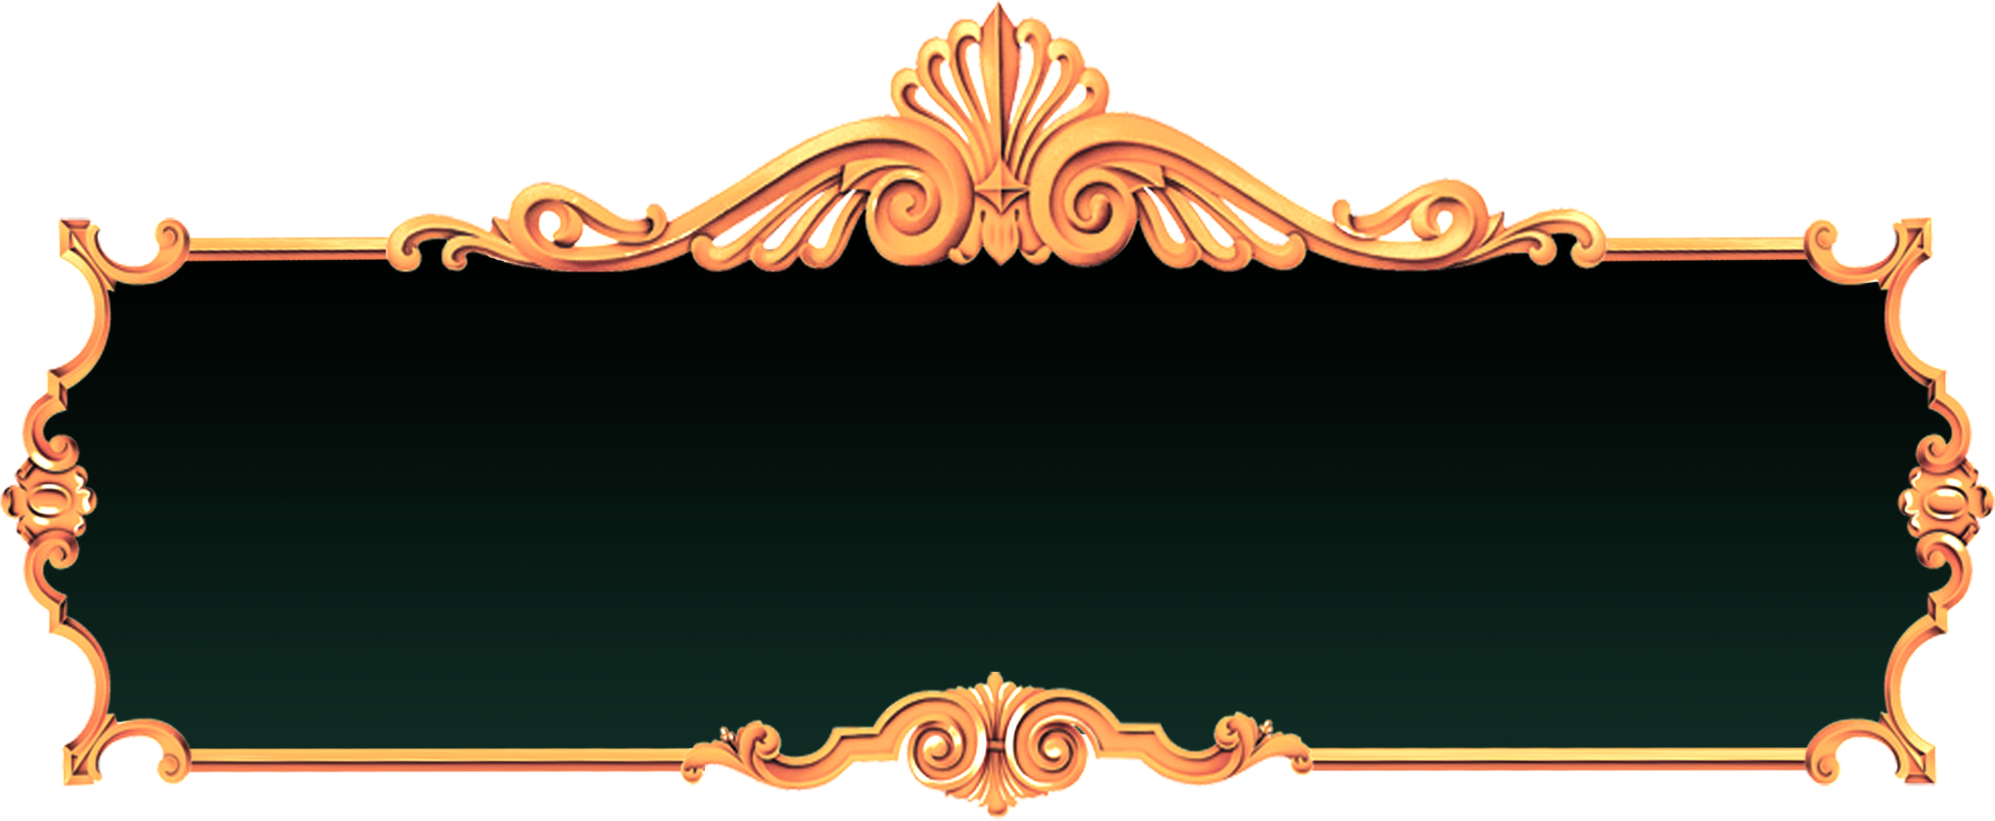 Pin On Design Doorgift 1